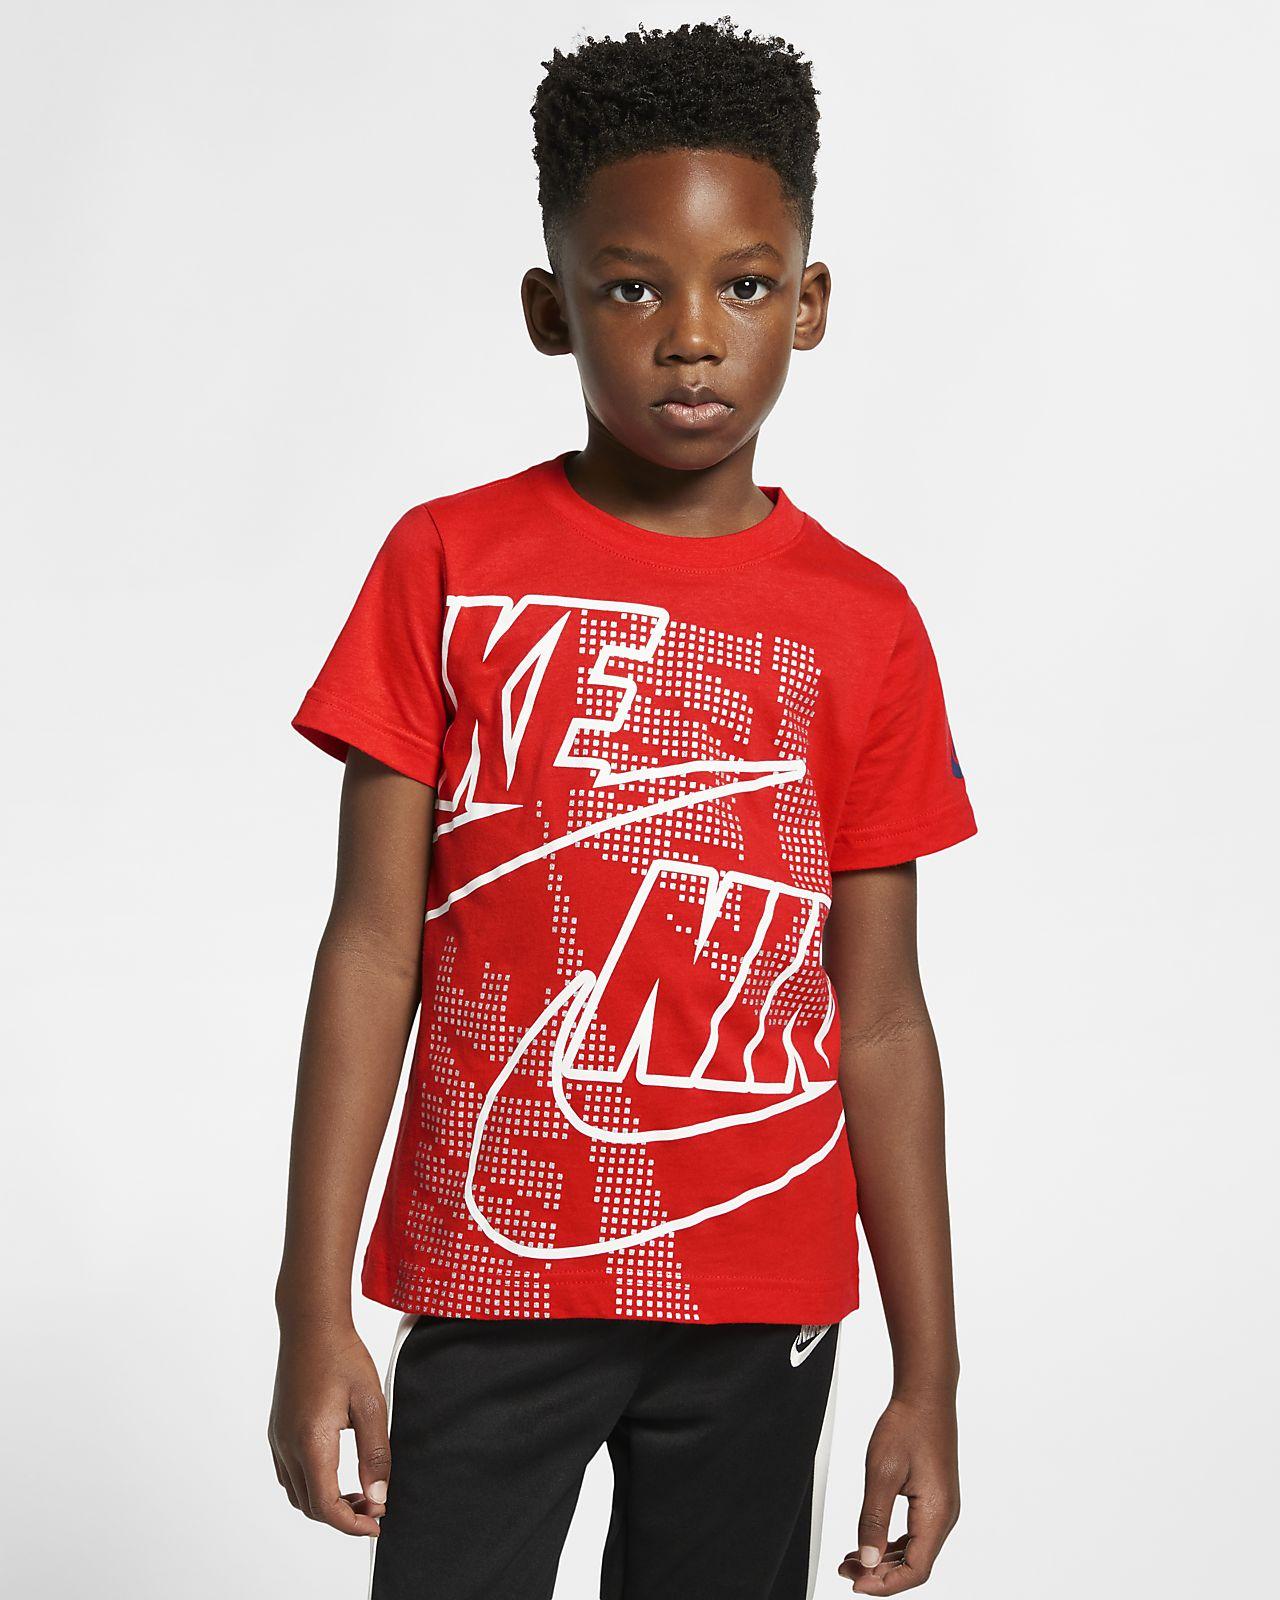 Nike Sportswear Camiseta - Niño/a pequeño/a